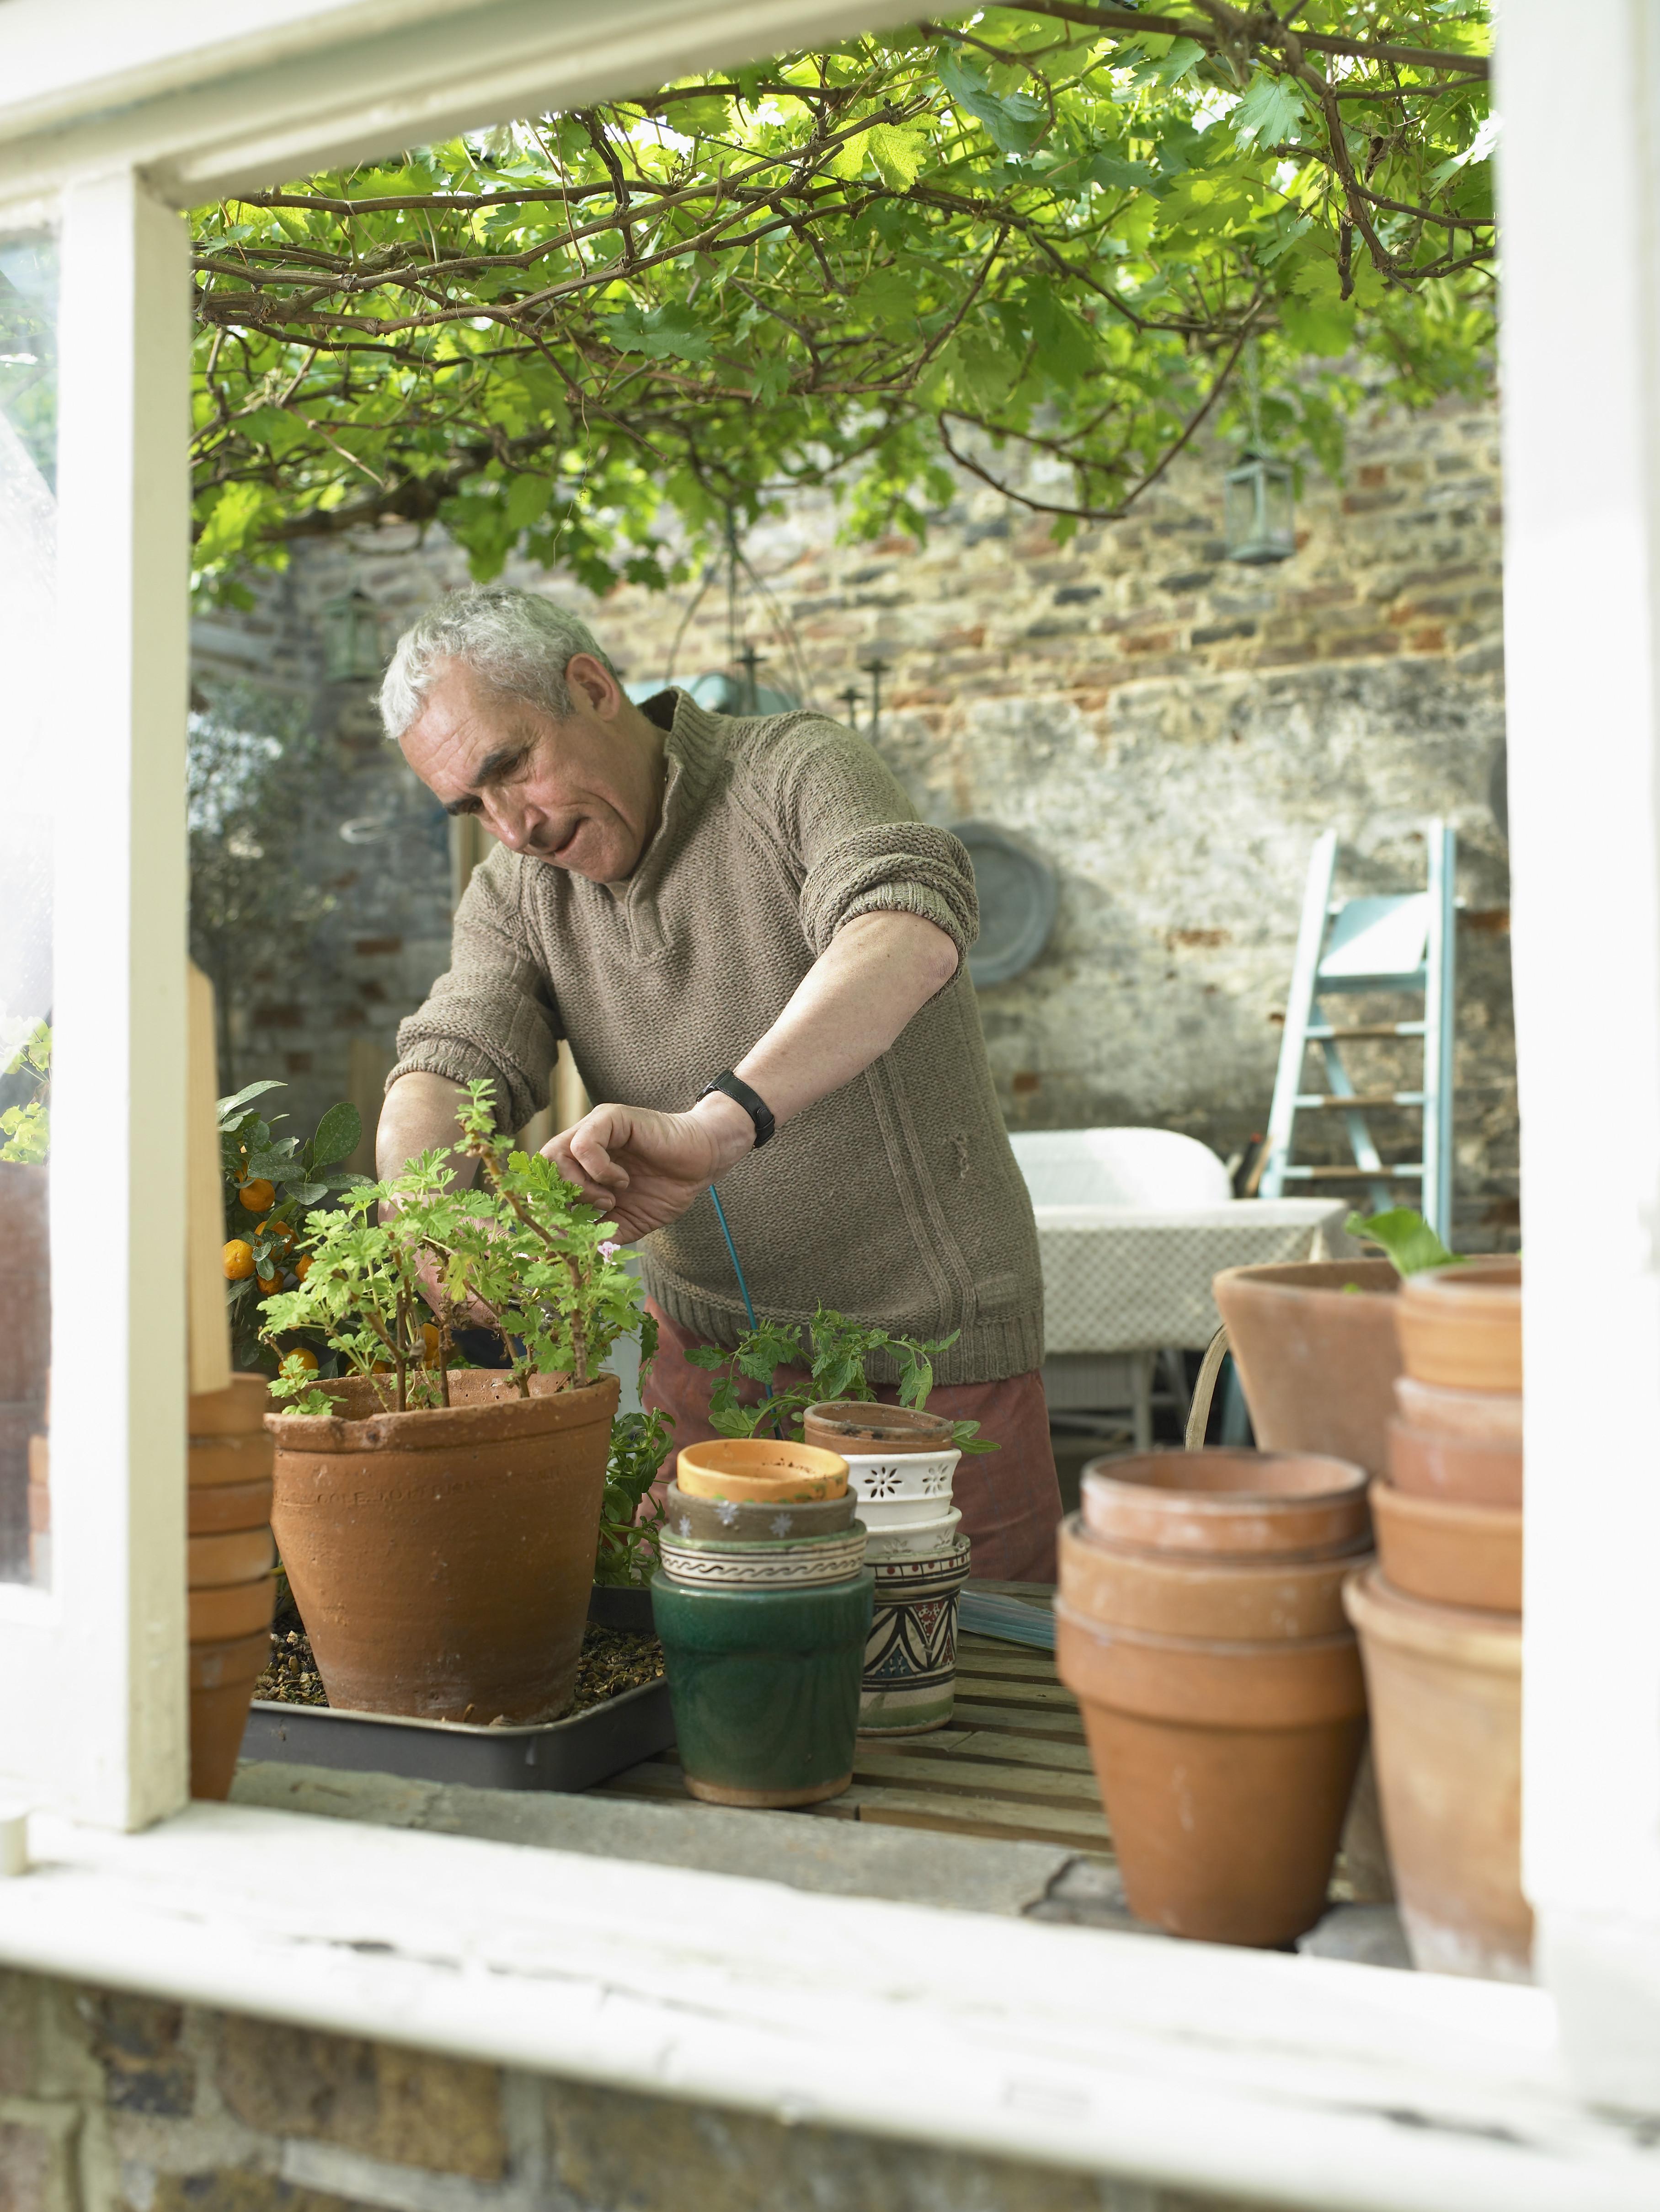 Senior man tending plants in greenhouse, view through window